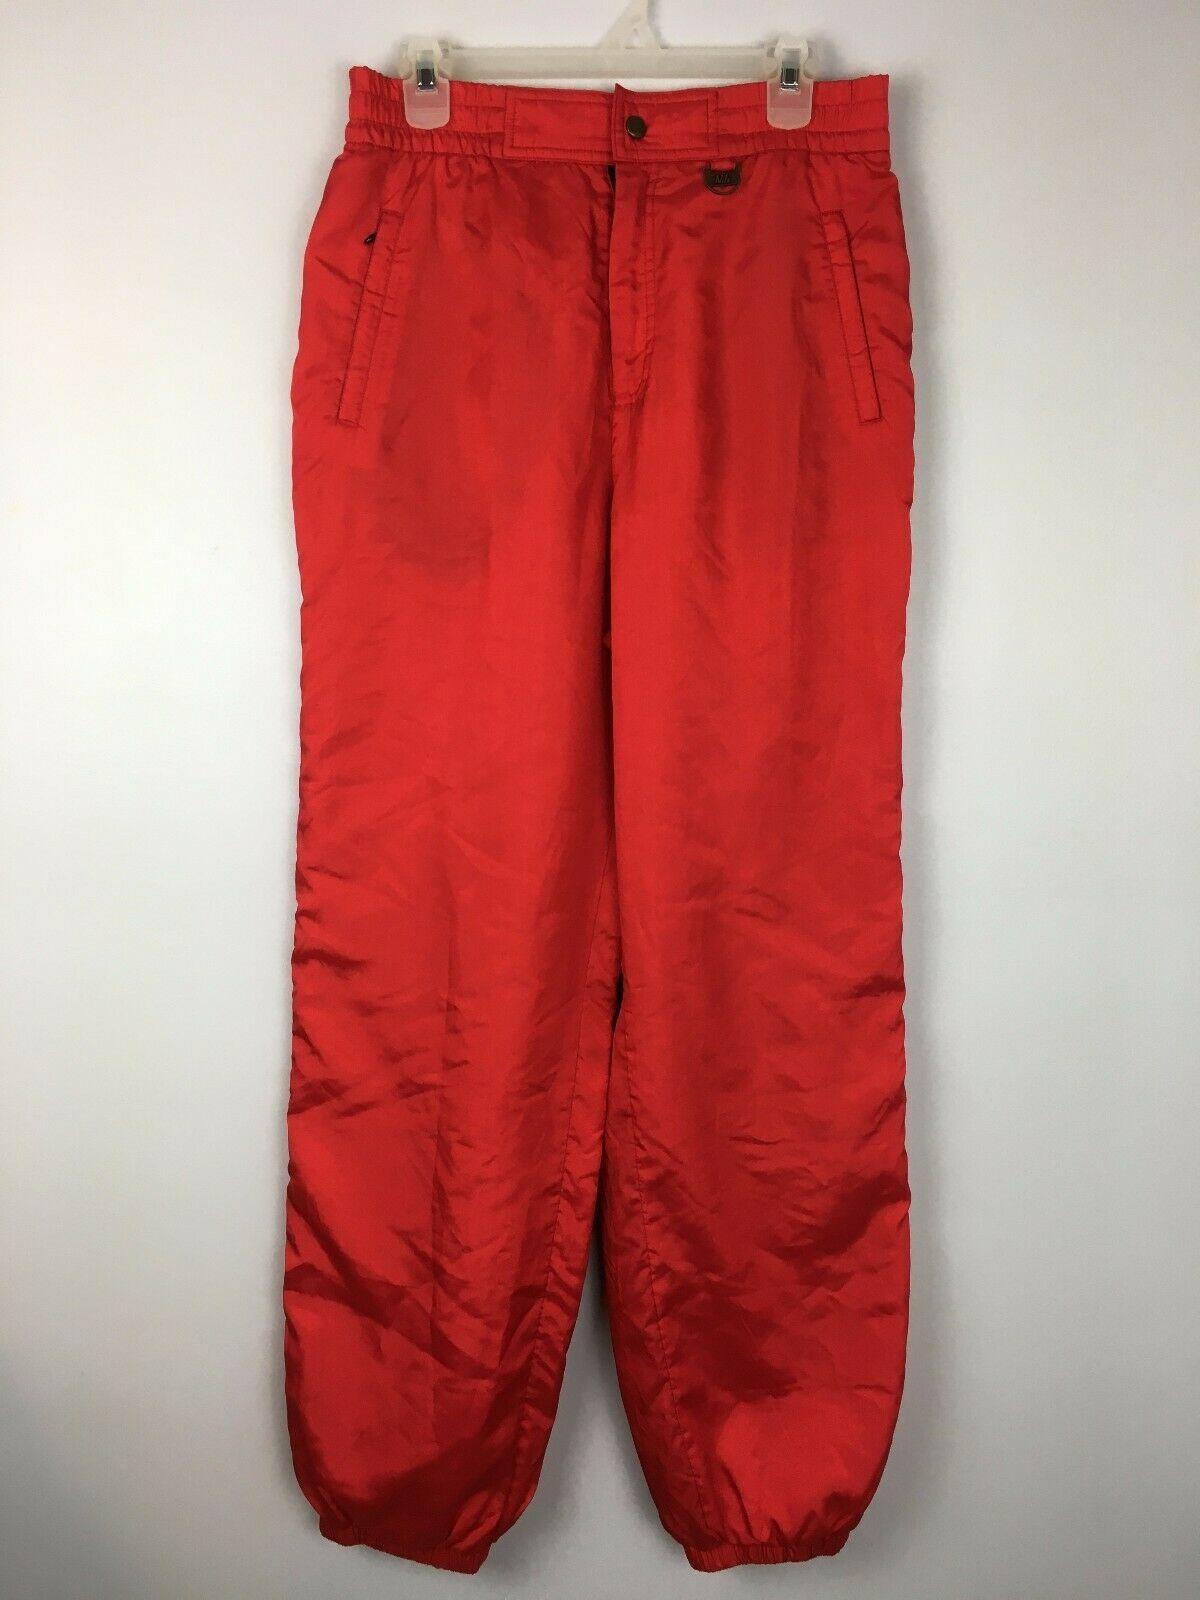 Nils Women's Red Vintage Snowsuit Ski Snow Board Pants Size 16